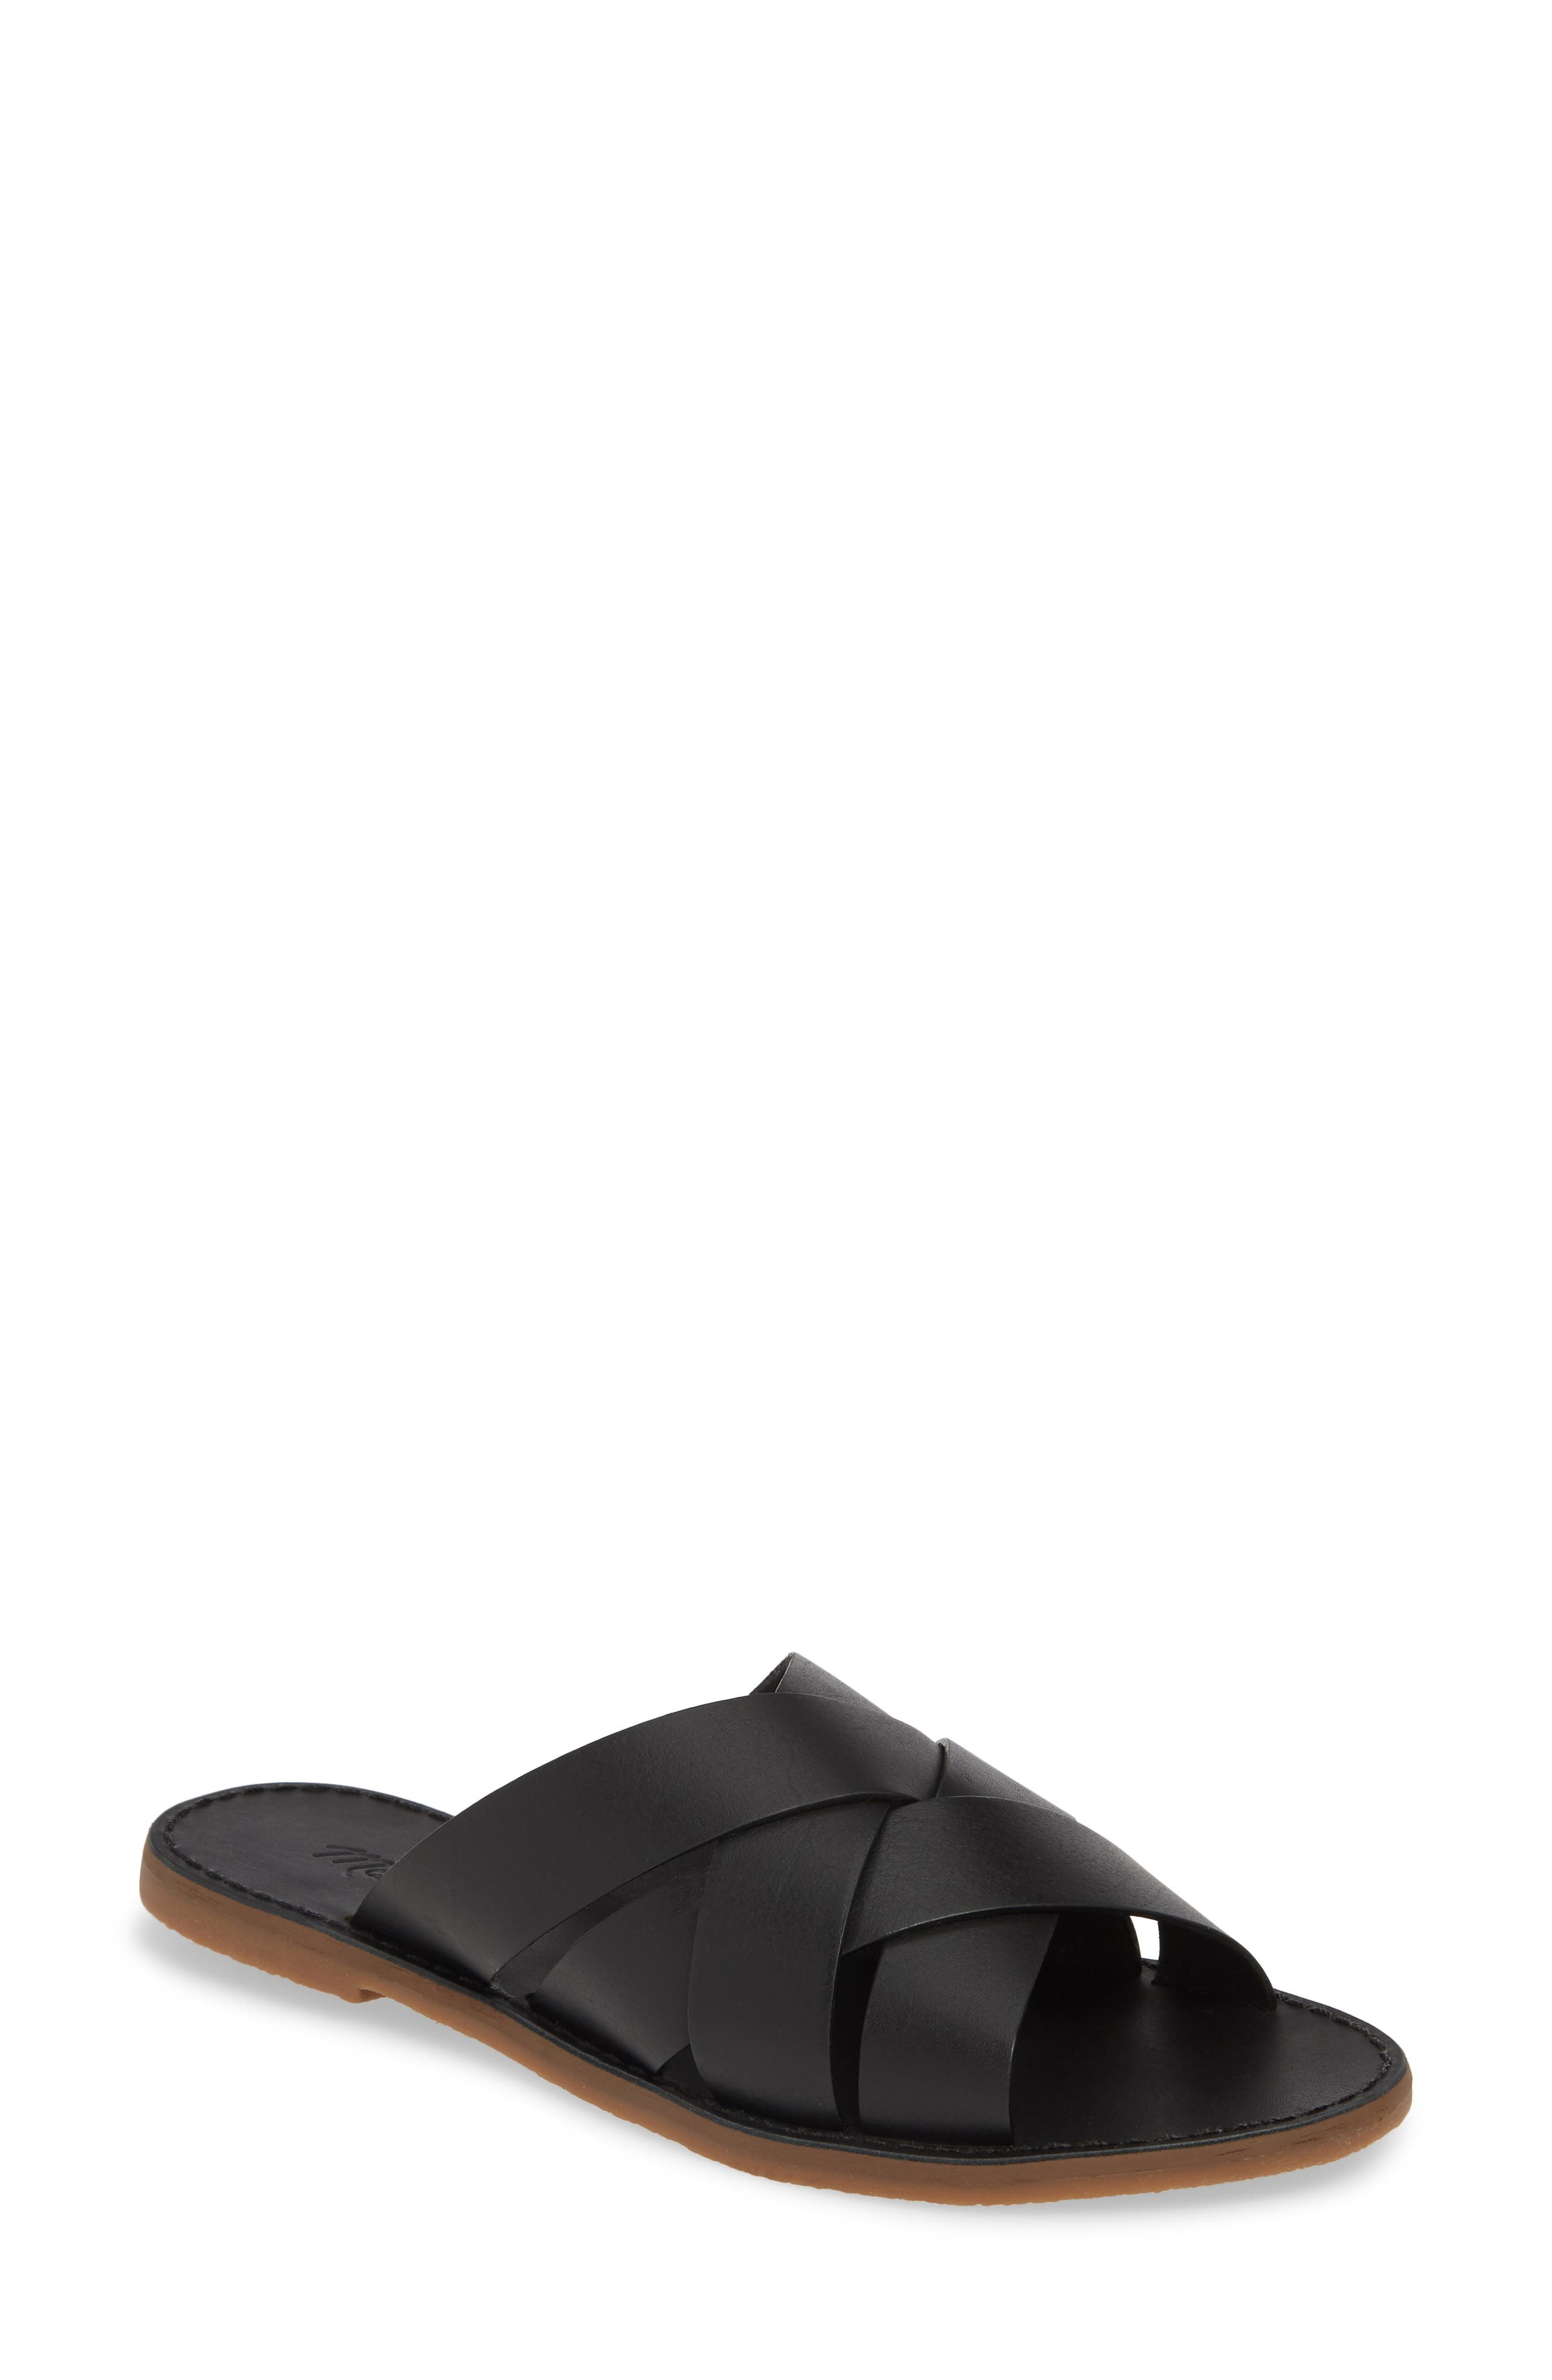 MADEWELL The Boardwalk Woven Slide Sandal, Main, color, TRUE BLACK